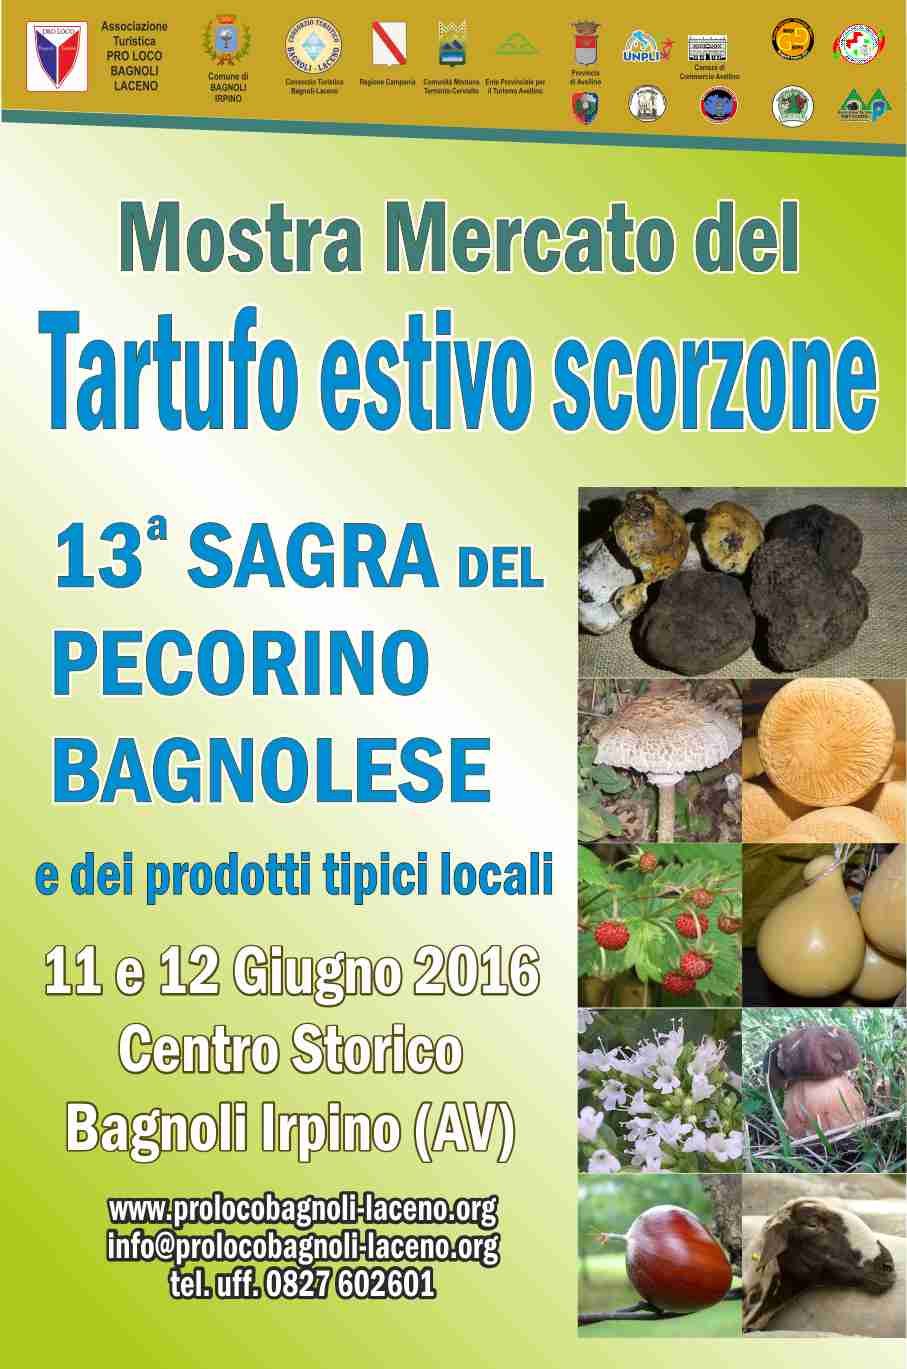 locandina-mostra-tartufo-estivo-scorzone-bagnoli-irpino